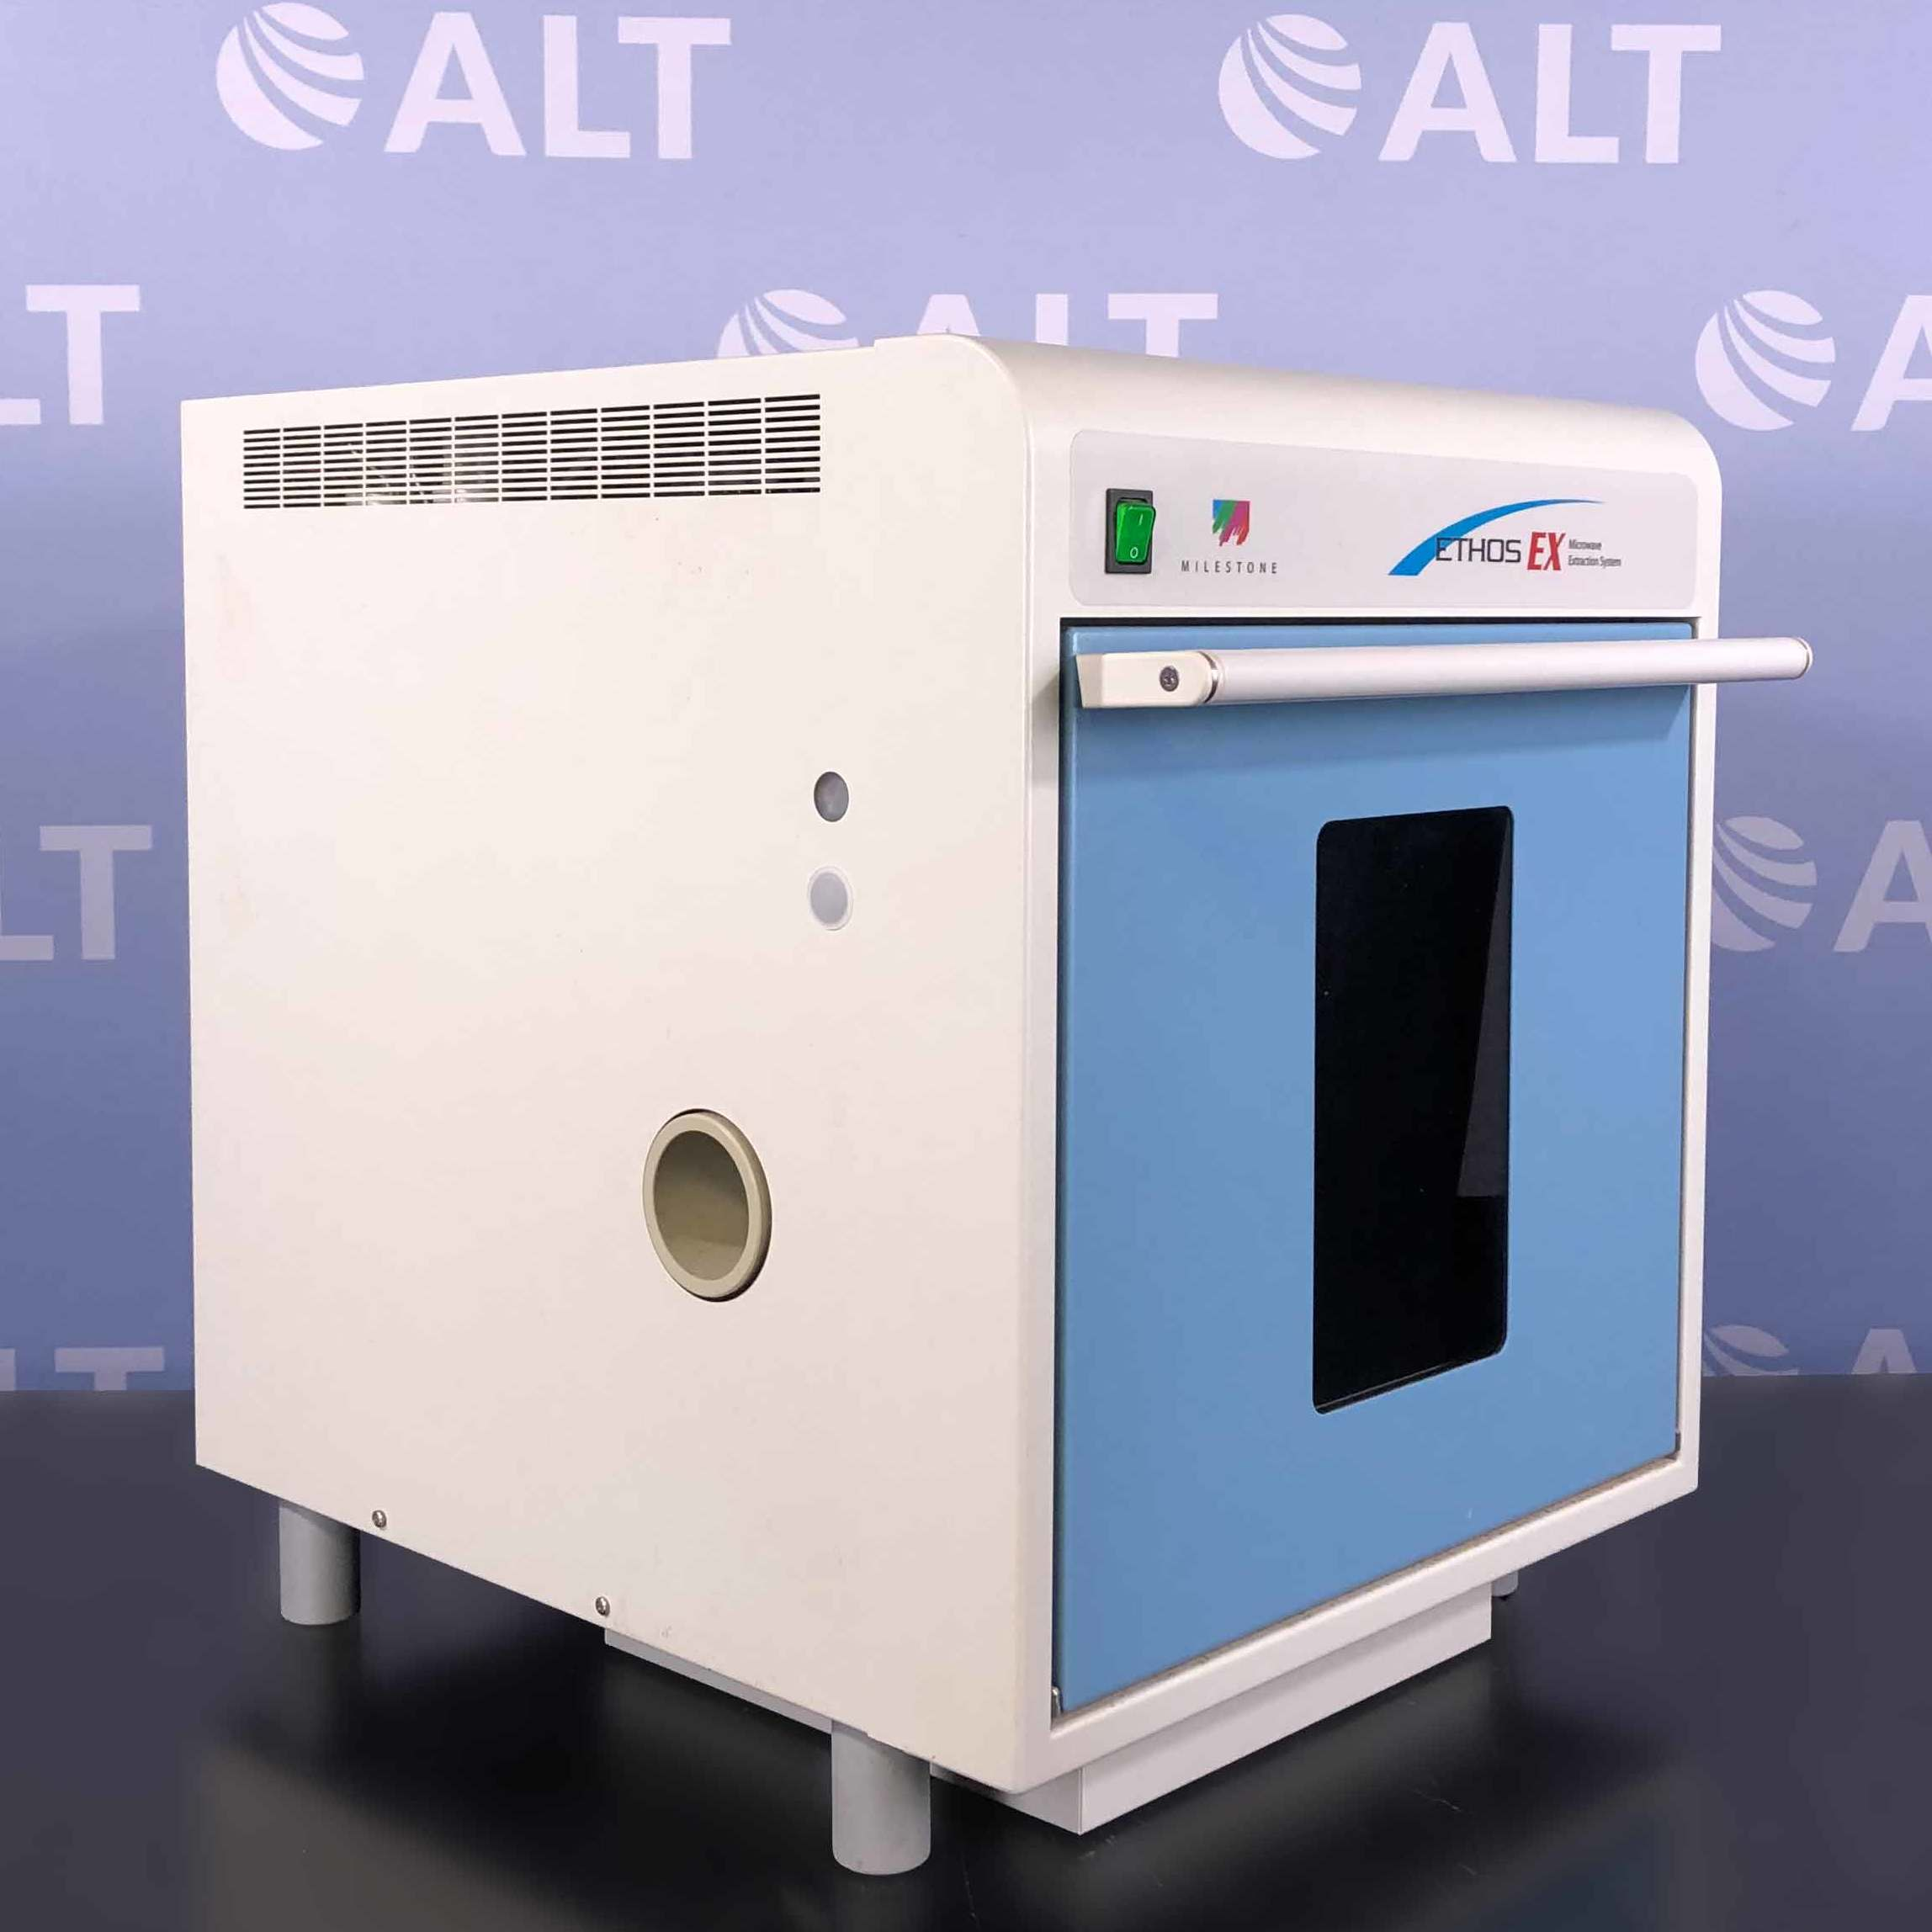 Milestone Ethos EX Microwave Extraction System Image